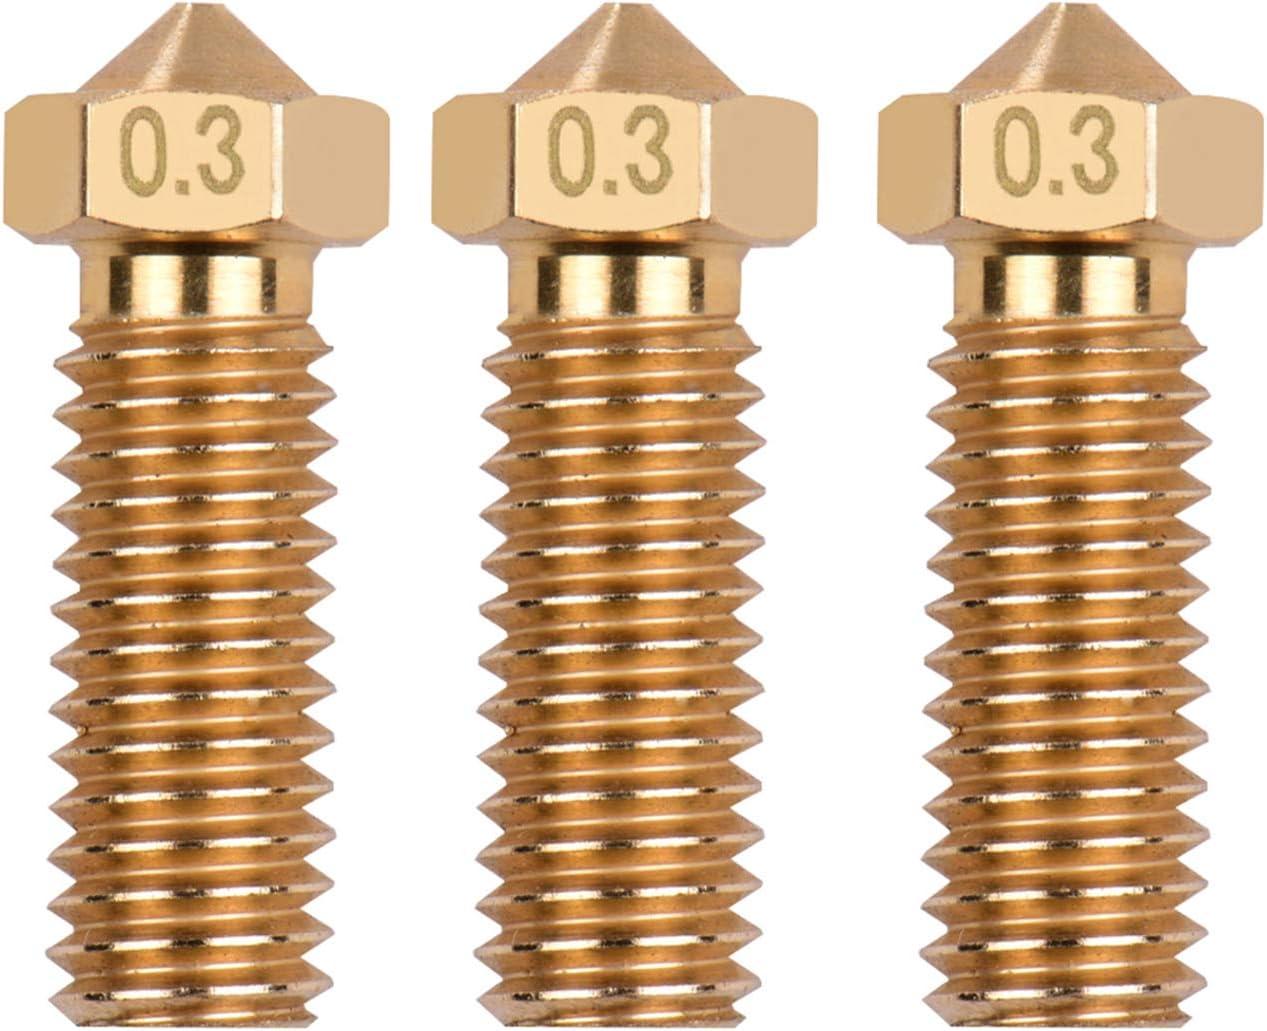 Entweg Extruder Nozzle 3pcs lowest price 3D Brass No Overseas parallel import regular item Printer Volcano